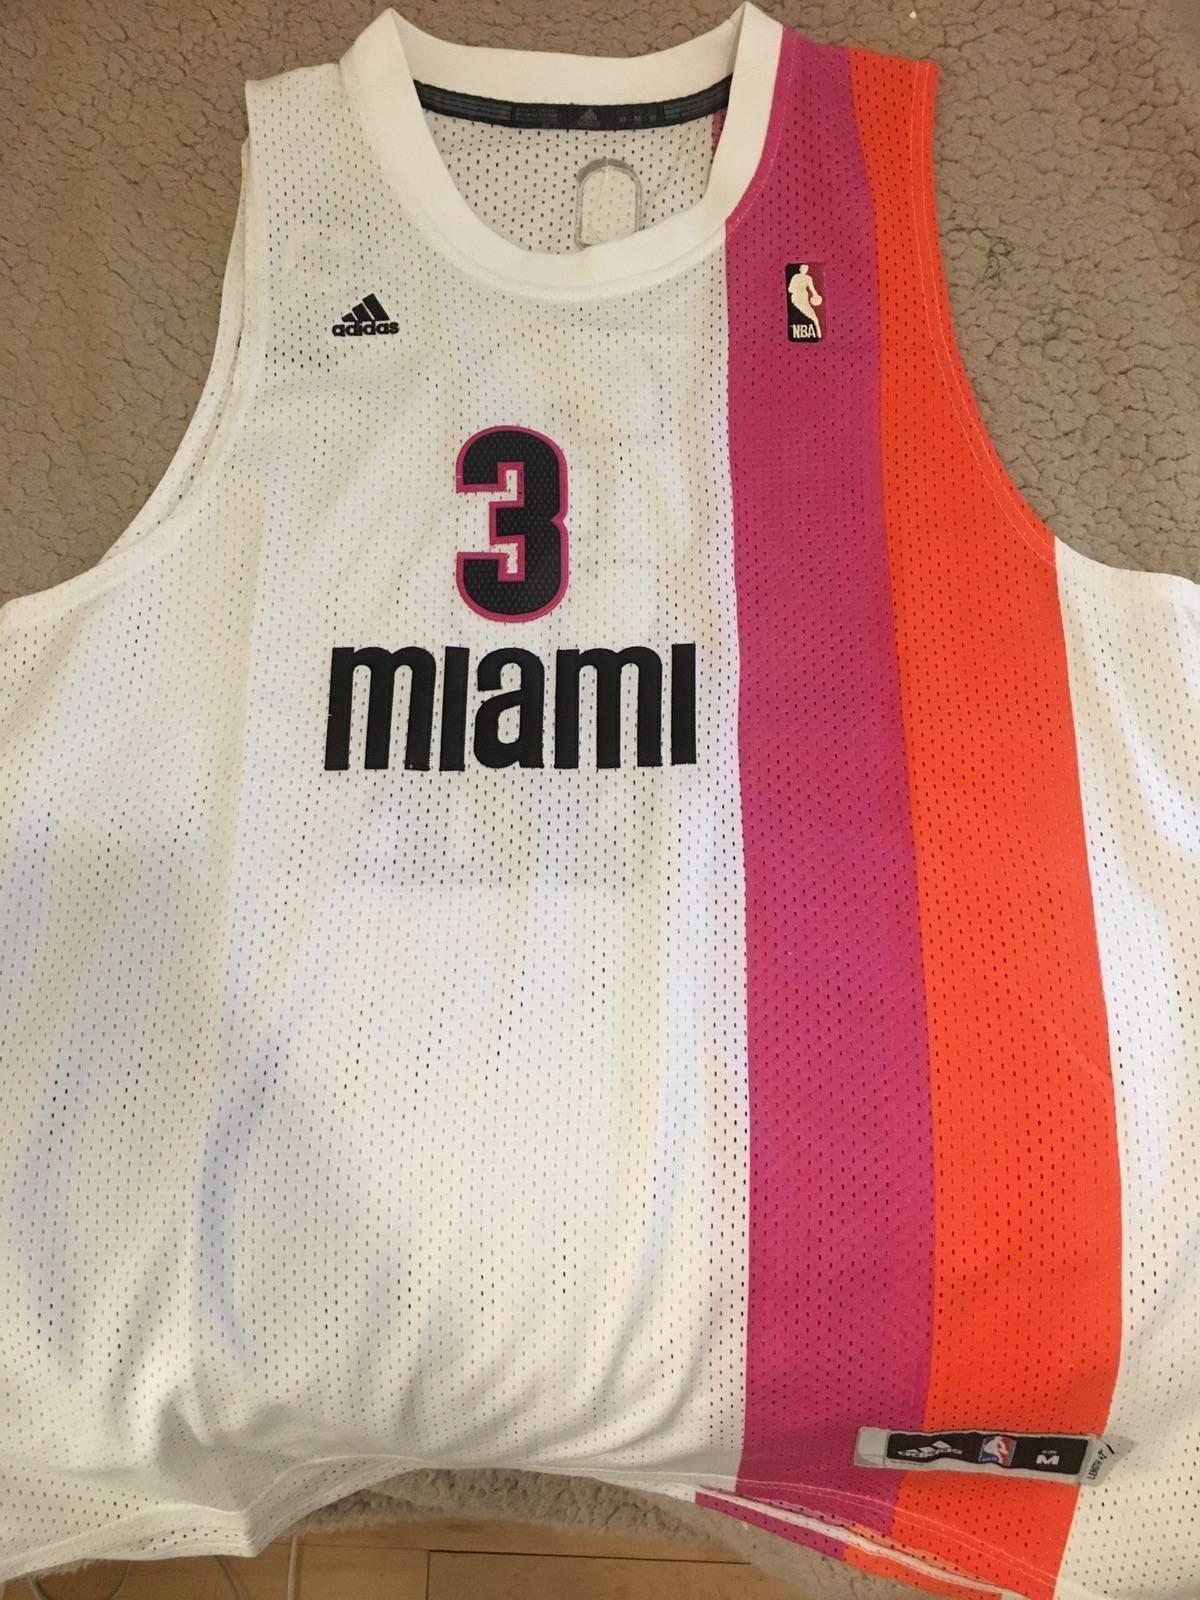 best service 37e68 71c4f Adidas Miami Heat Dwyane Wade Jersey Size M $56